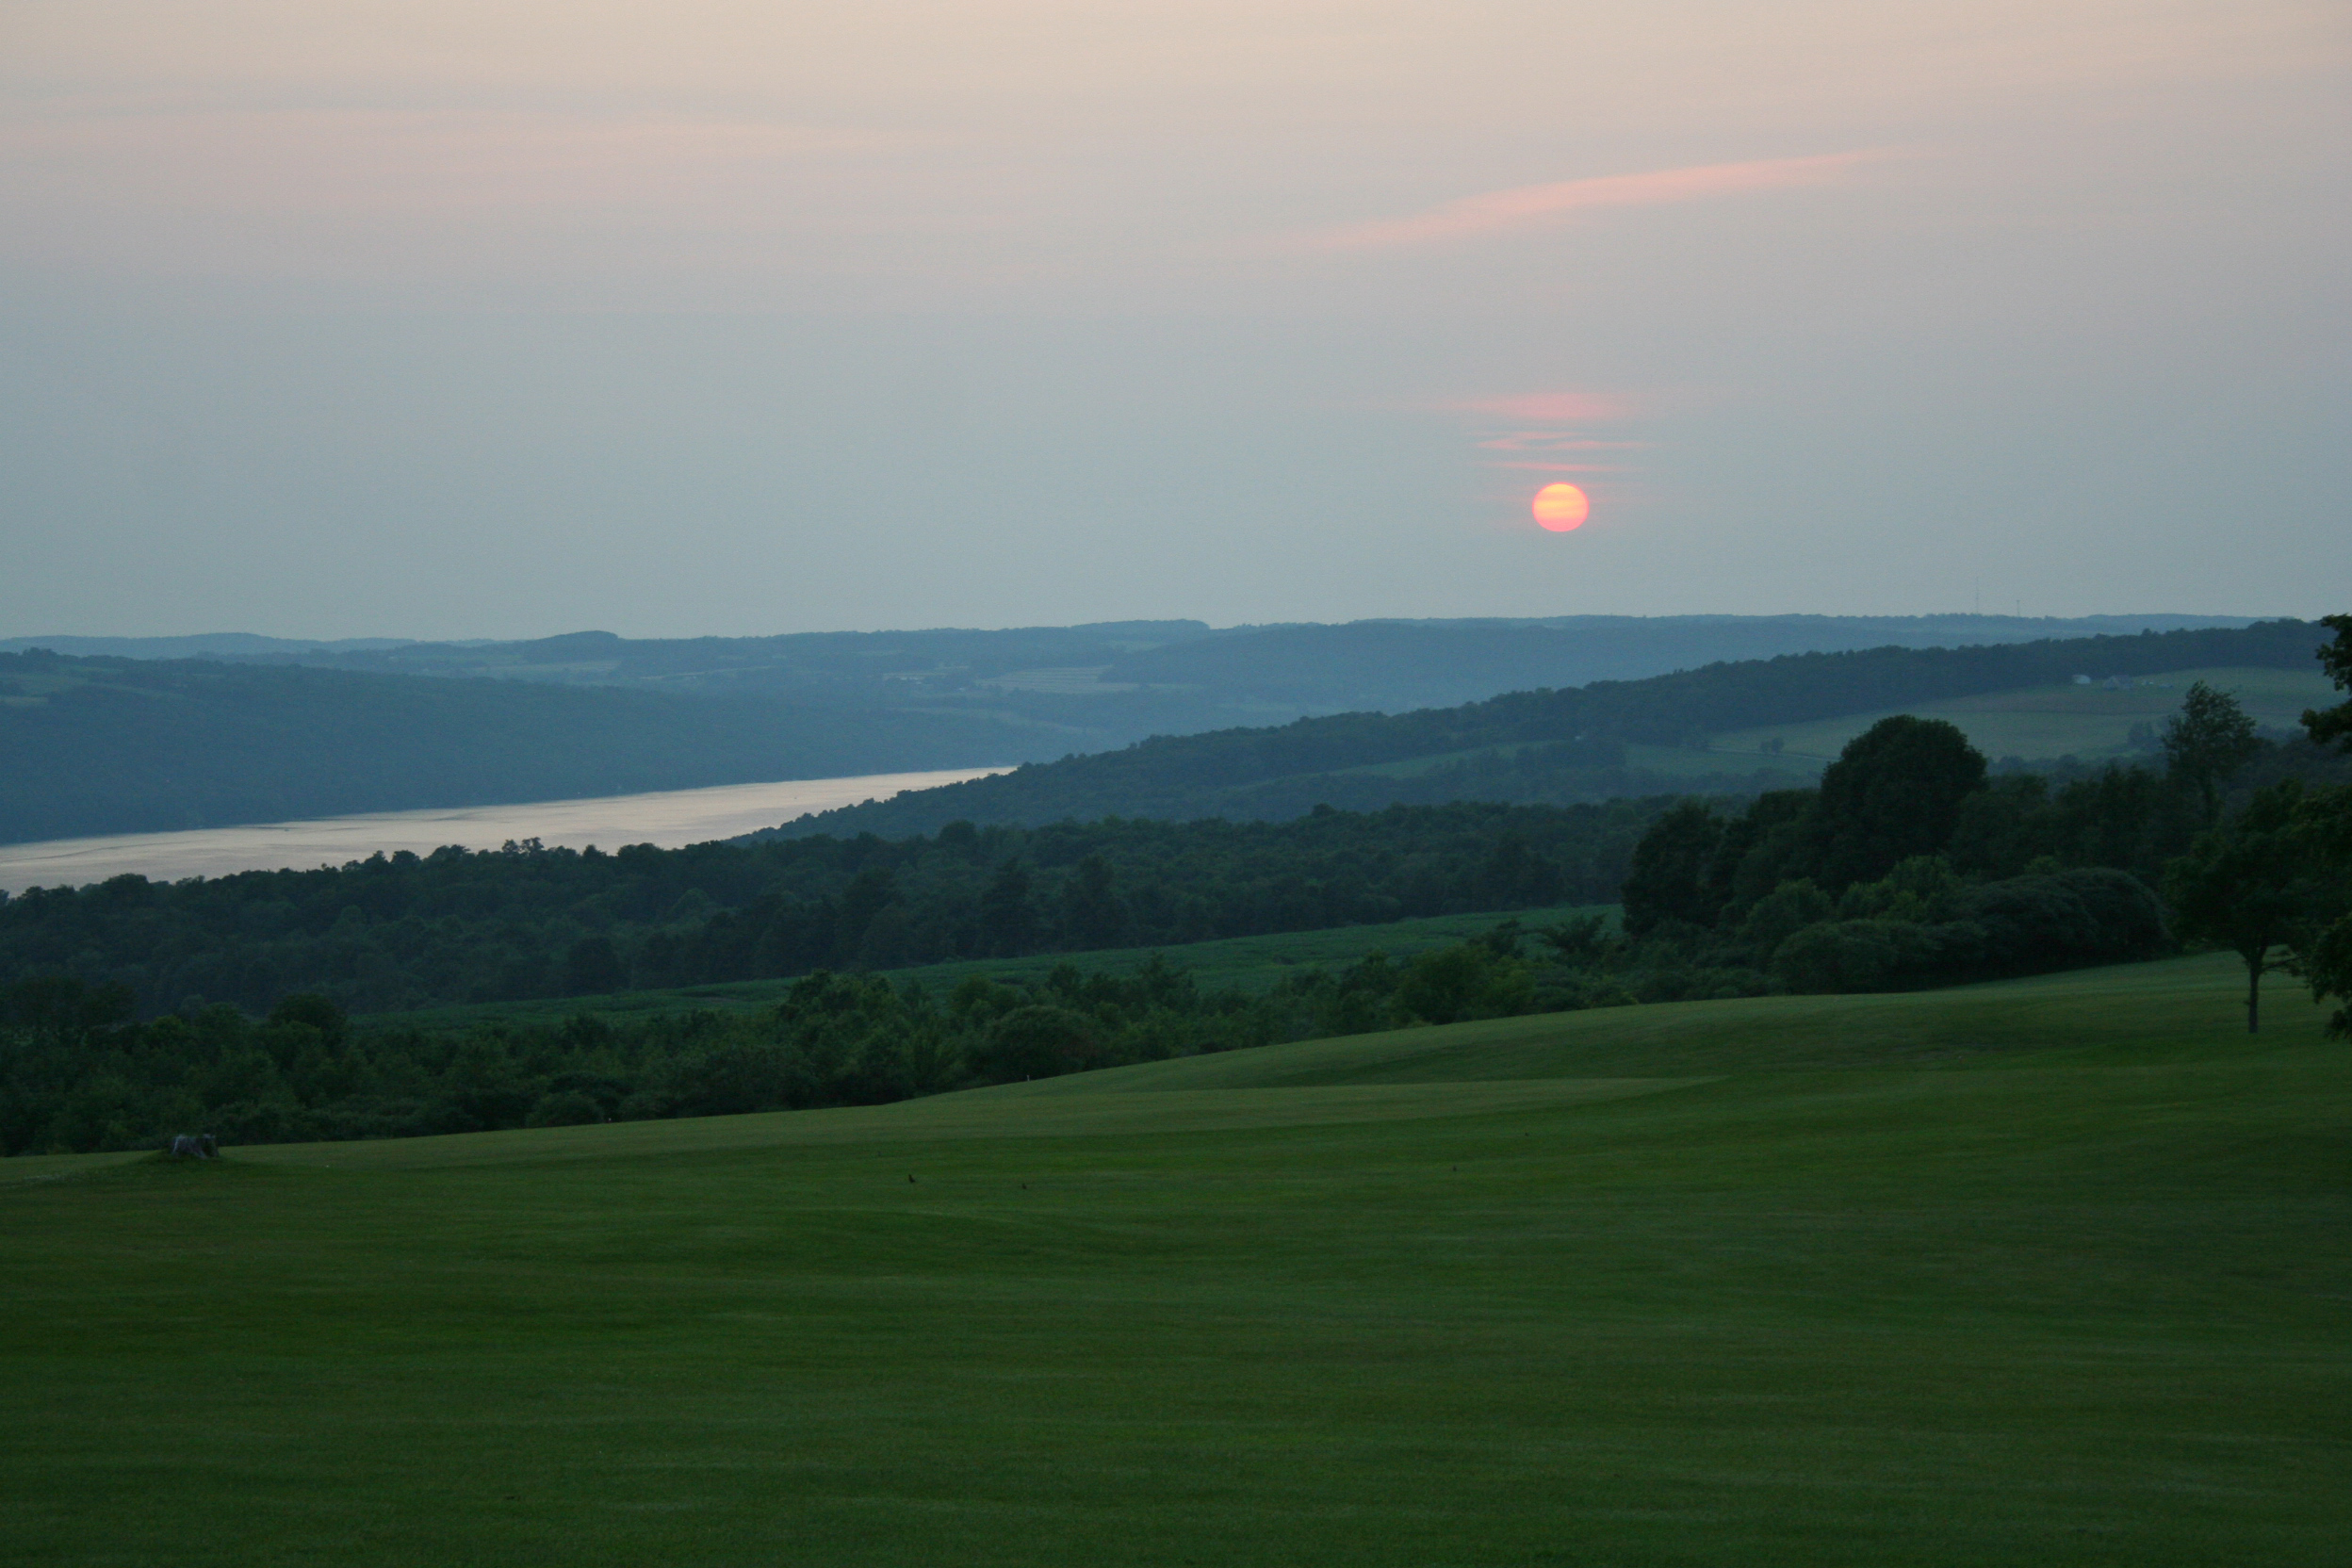 sunset_7-11-15_1